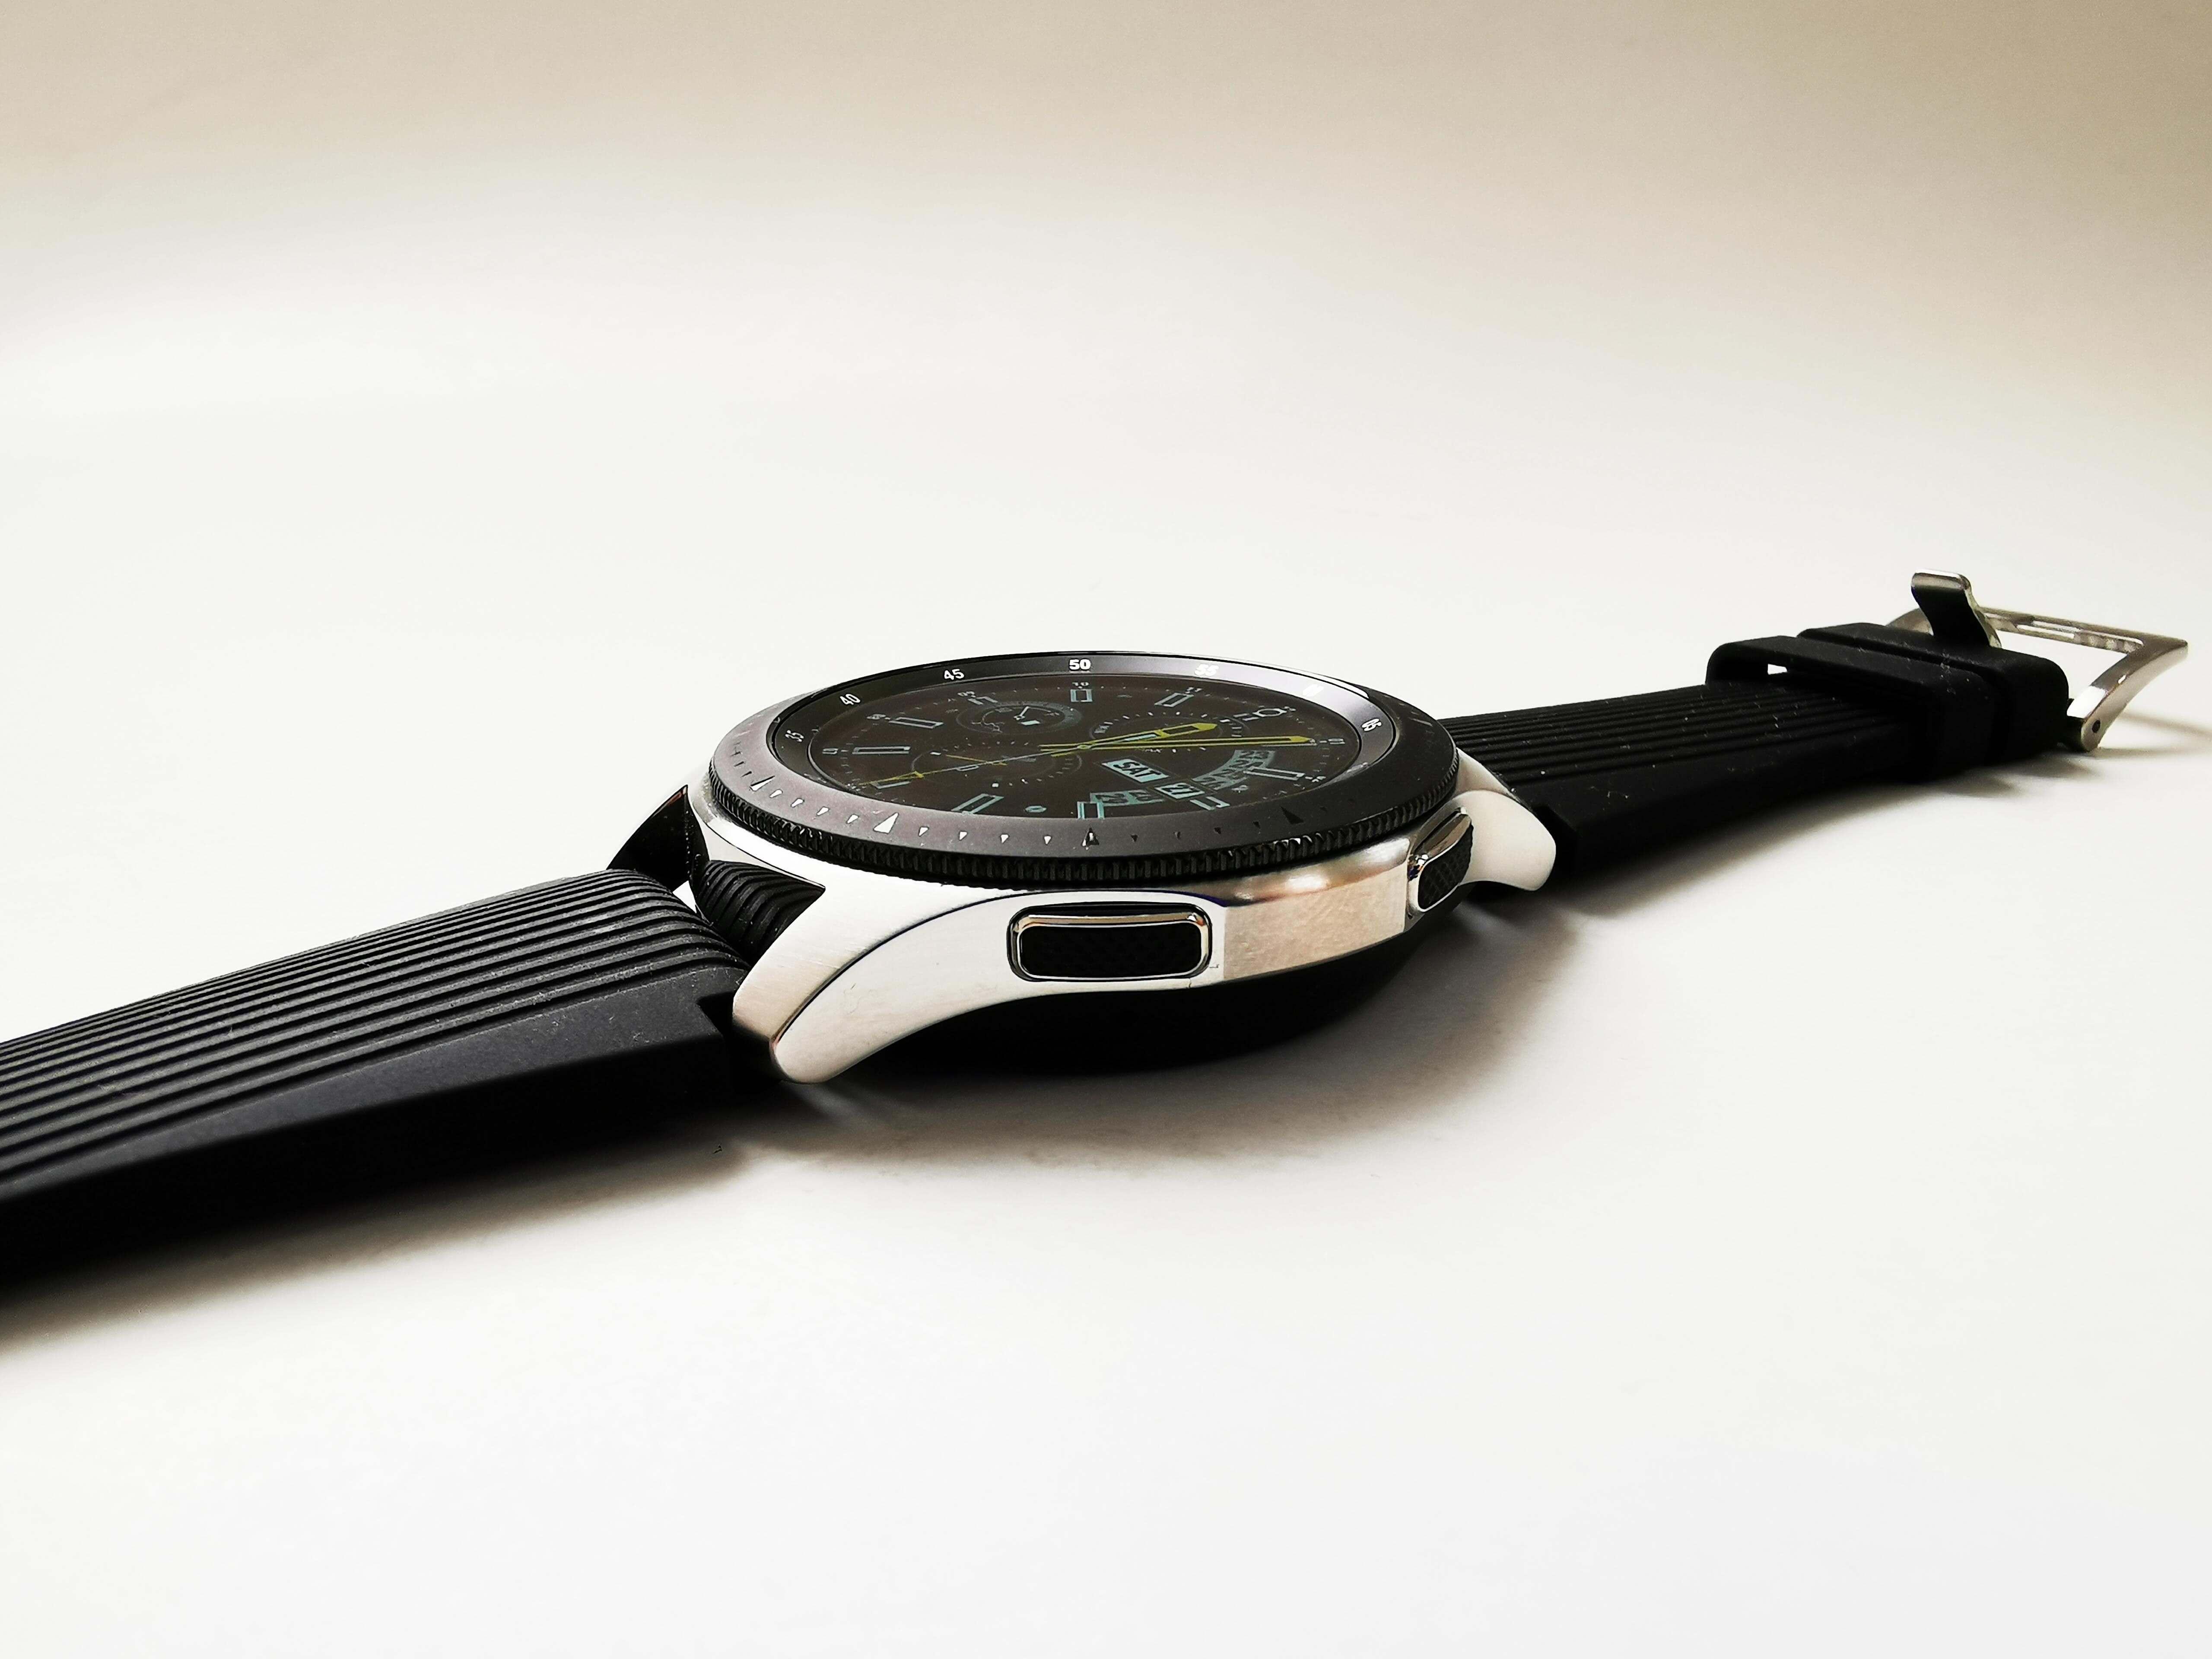 Samsung Galaxy Watch Review Romana si Pareri - Foto 2